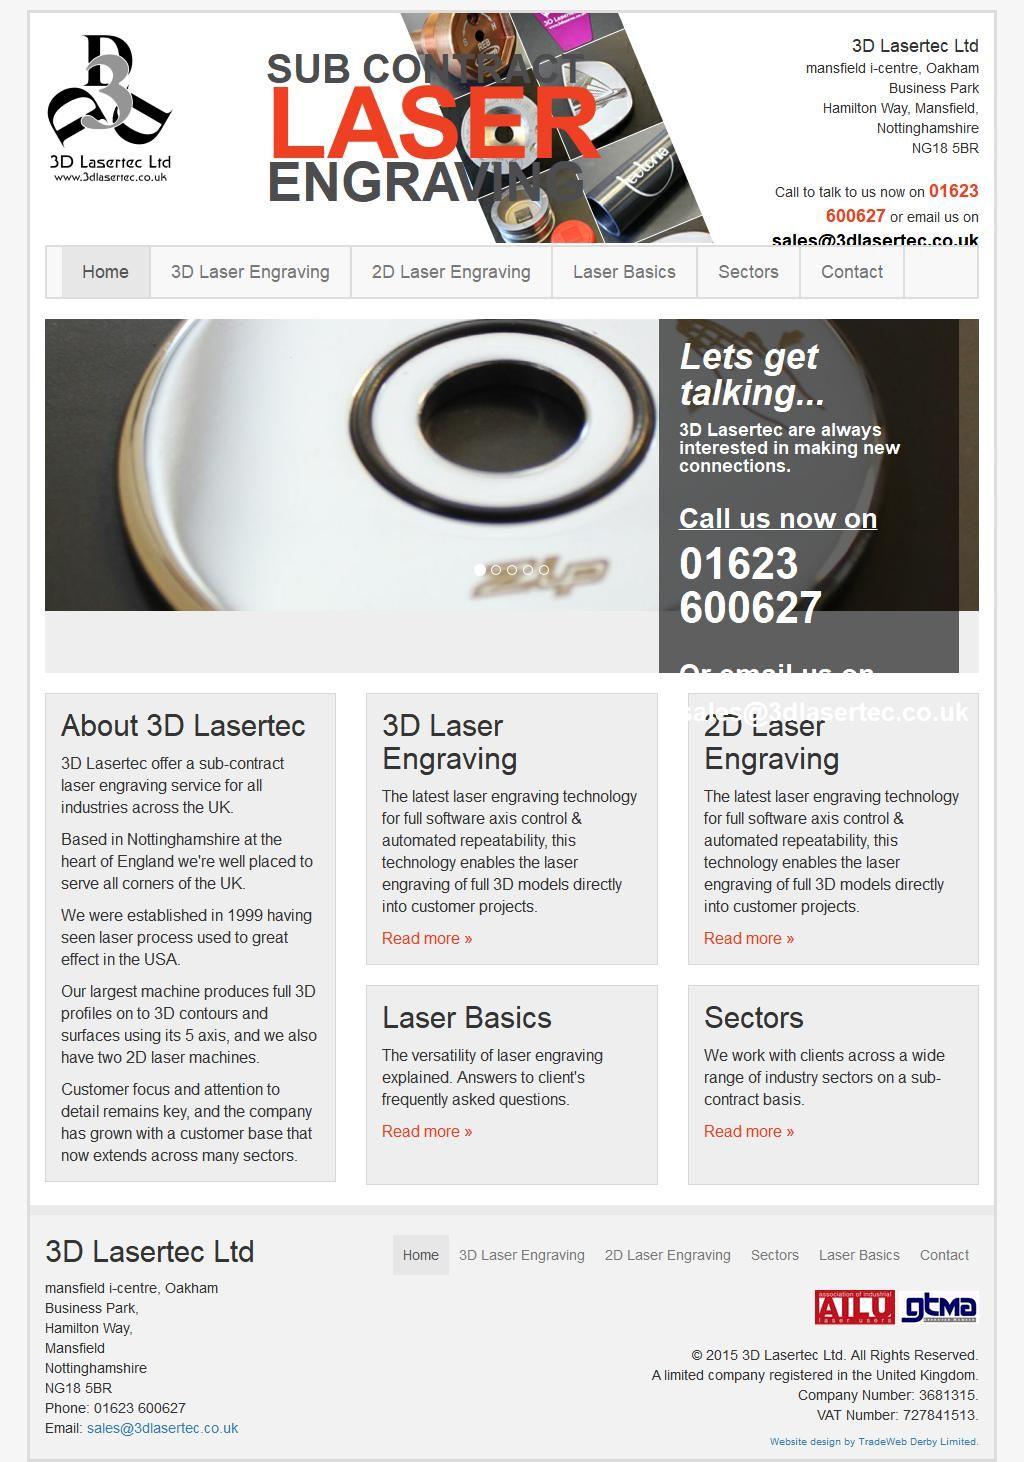 3D Lasertec Ltd Engraving Mansfield I Centre/Oakham